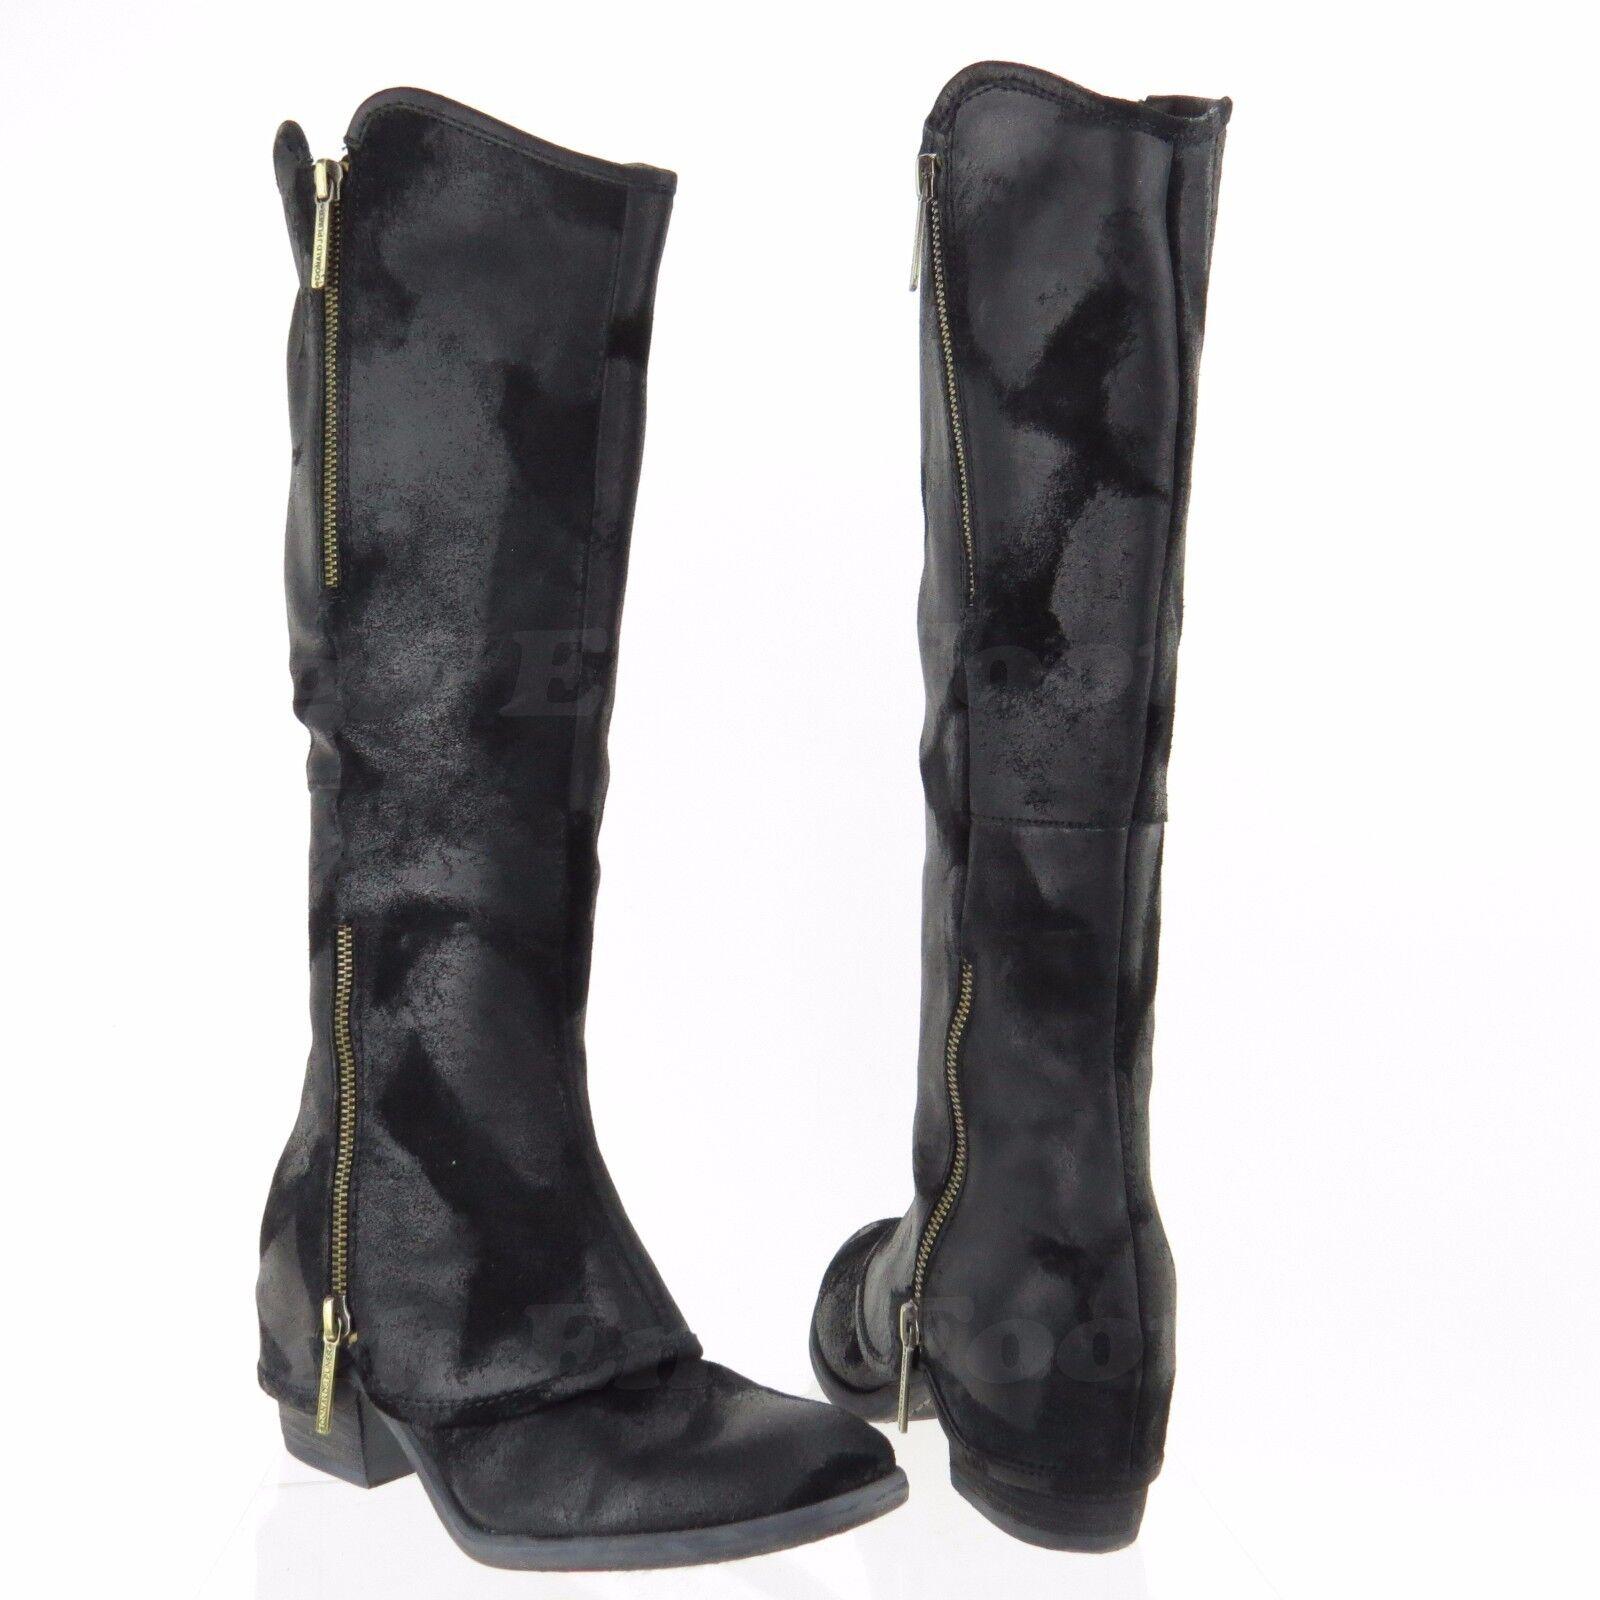 Donald Donald Donald J Pliner Devi 3 Mujer Zapatos Negro botas de estilo occidental Talla 5.5 m  428  hasta 60% de descuento